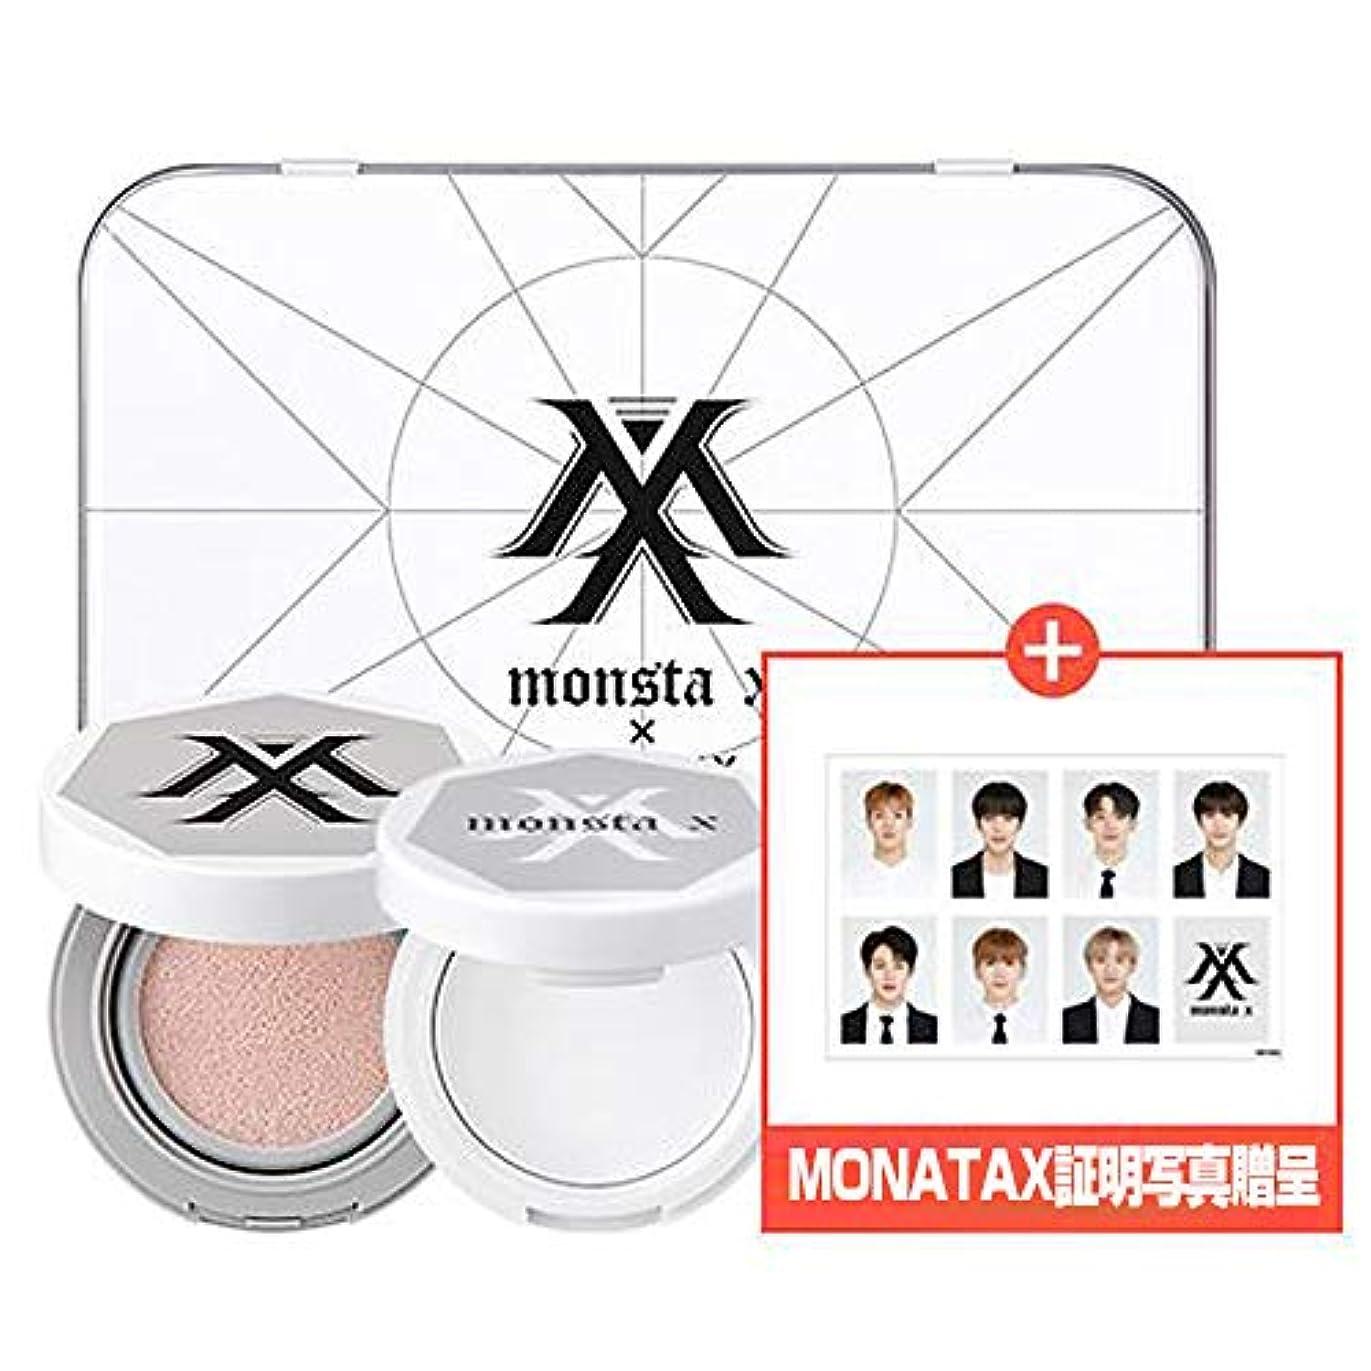 Tone UP TIN SET TONYMOLY× MONSTA X [トーンアップクッション][油紙ファクト][MonstaX証明写真付き][トニモリ][韓国コスメ] [並行輸入品]